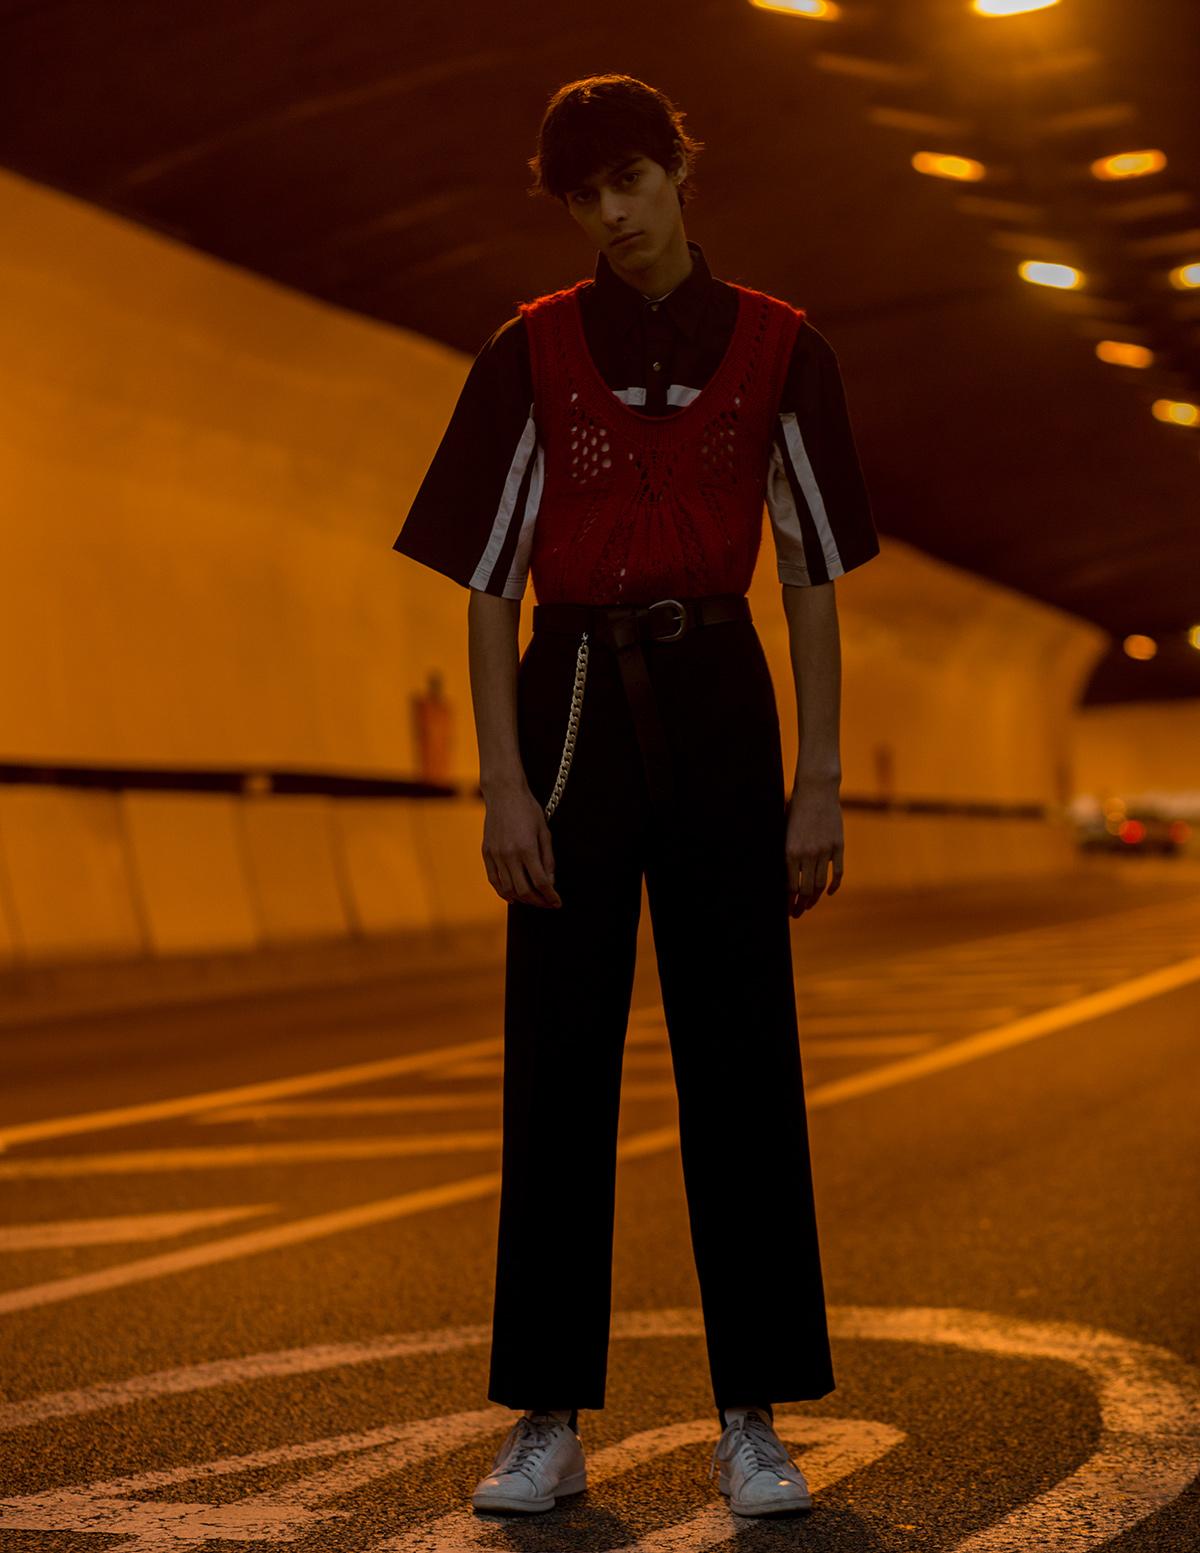 Shirt Wrangler, yop Japper, trousers Sandro, sneakers Adidas x Raf Simons.